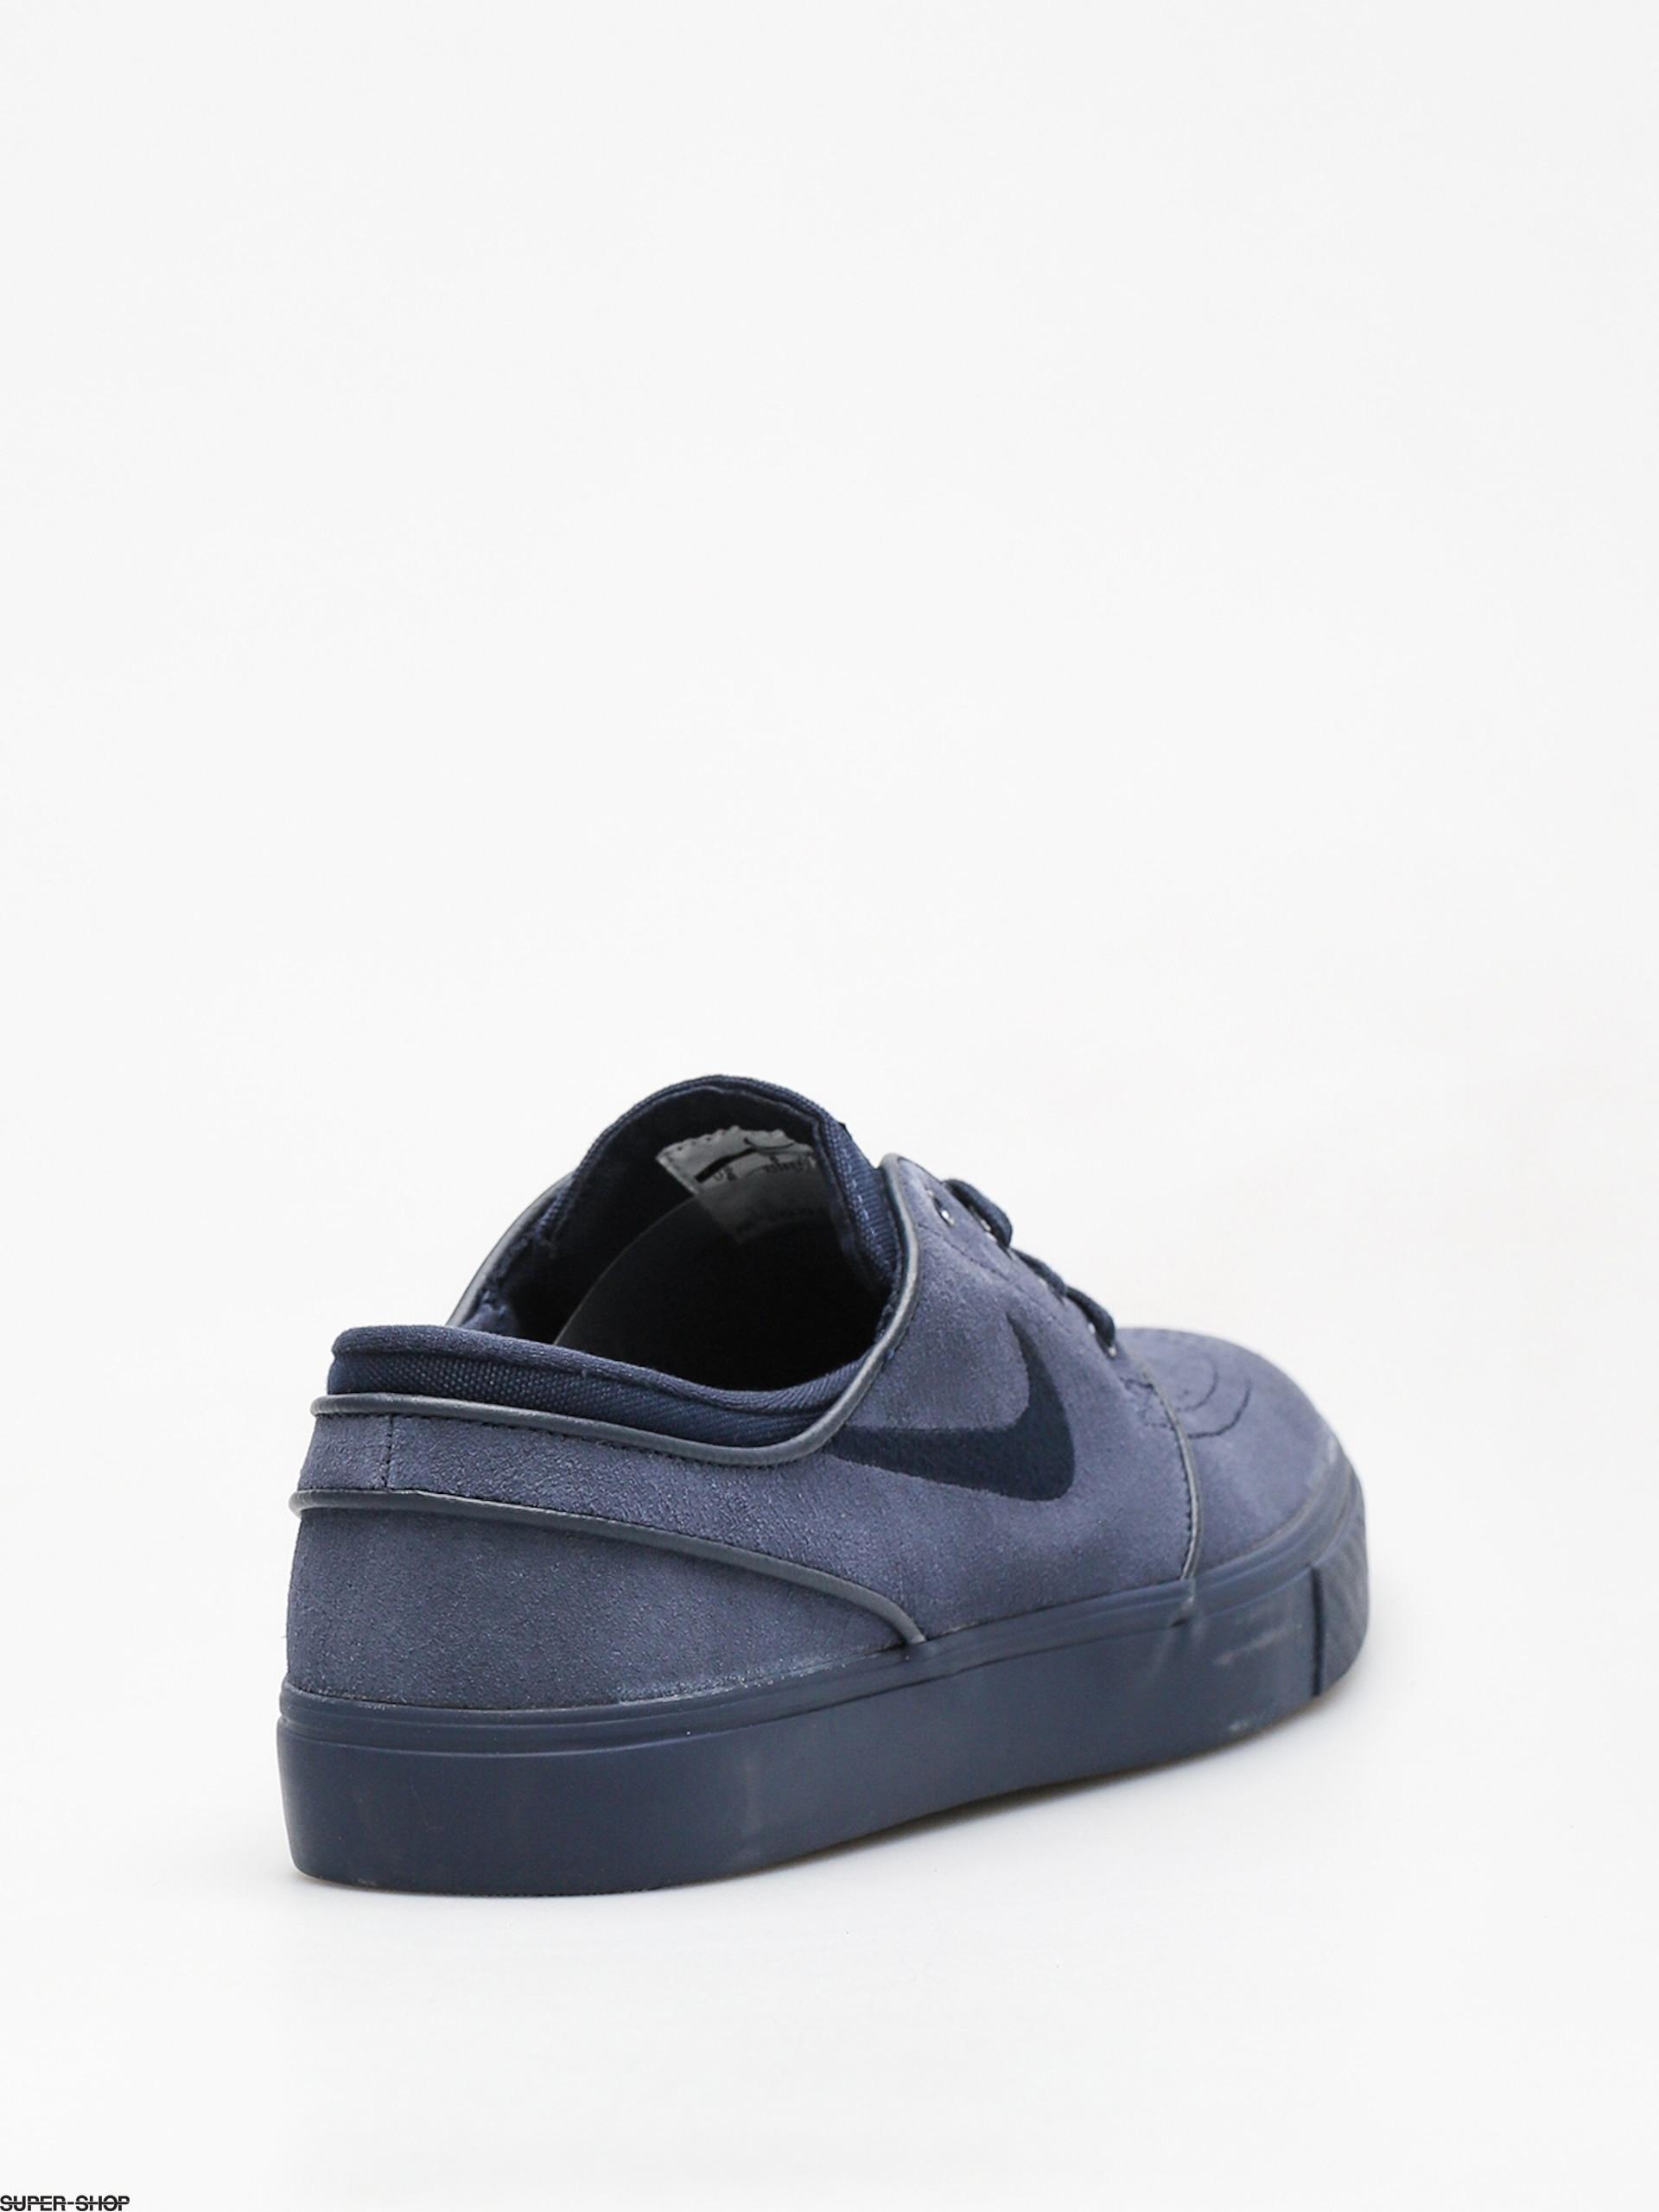 5d99d54c6c Nike SB Sb Zoom Stefan Janoski Shoes (obsidian obsidian obsidian phantom)